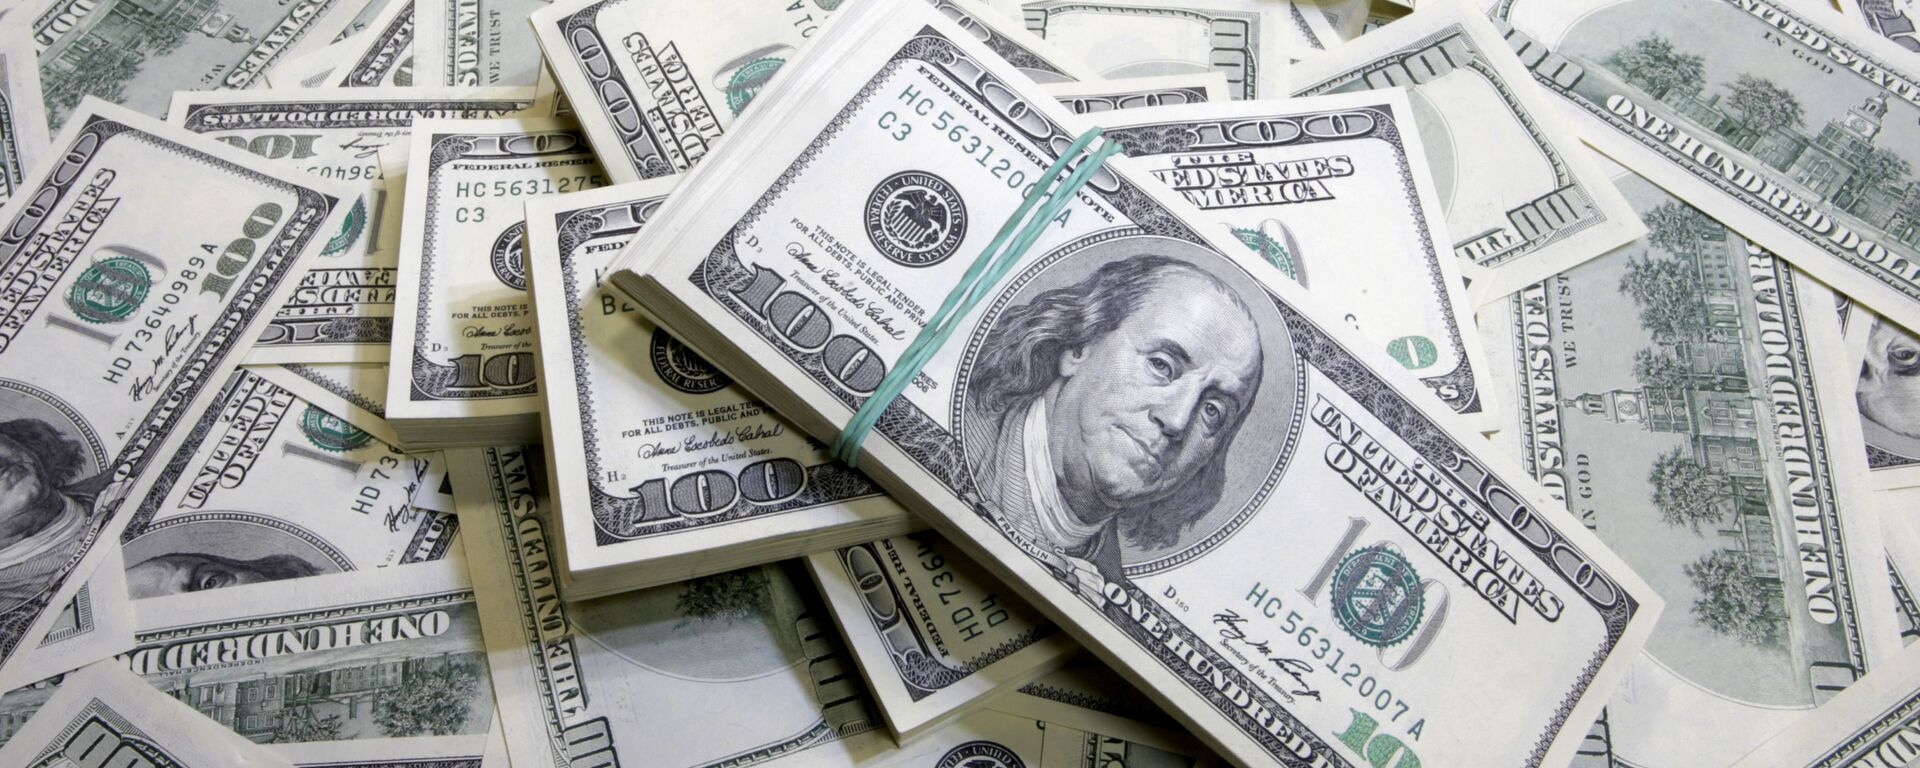 Доллары США - Sputnik Таджикистан, 1920, 18.08.2021